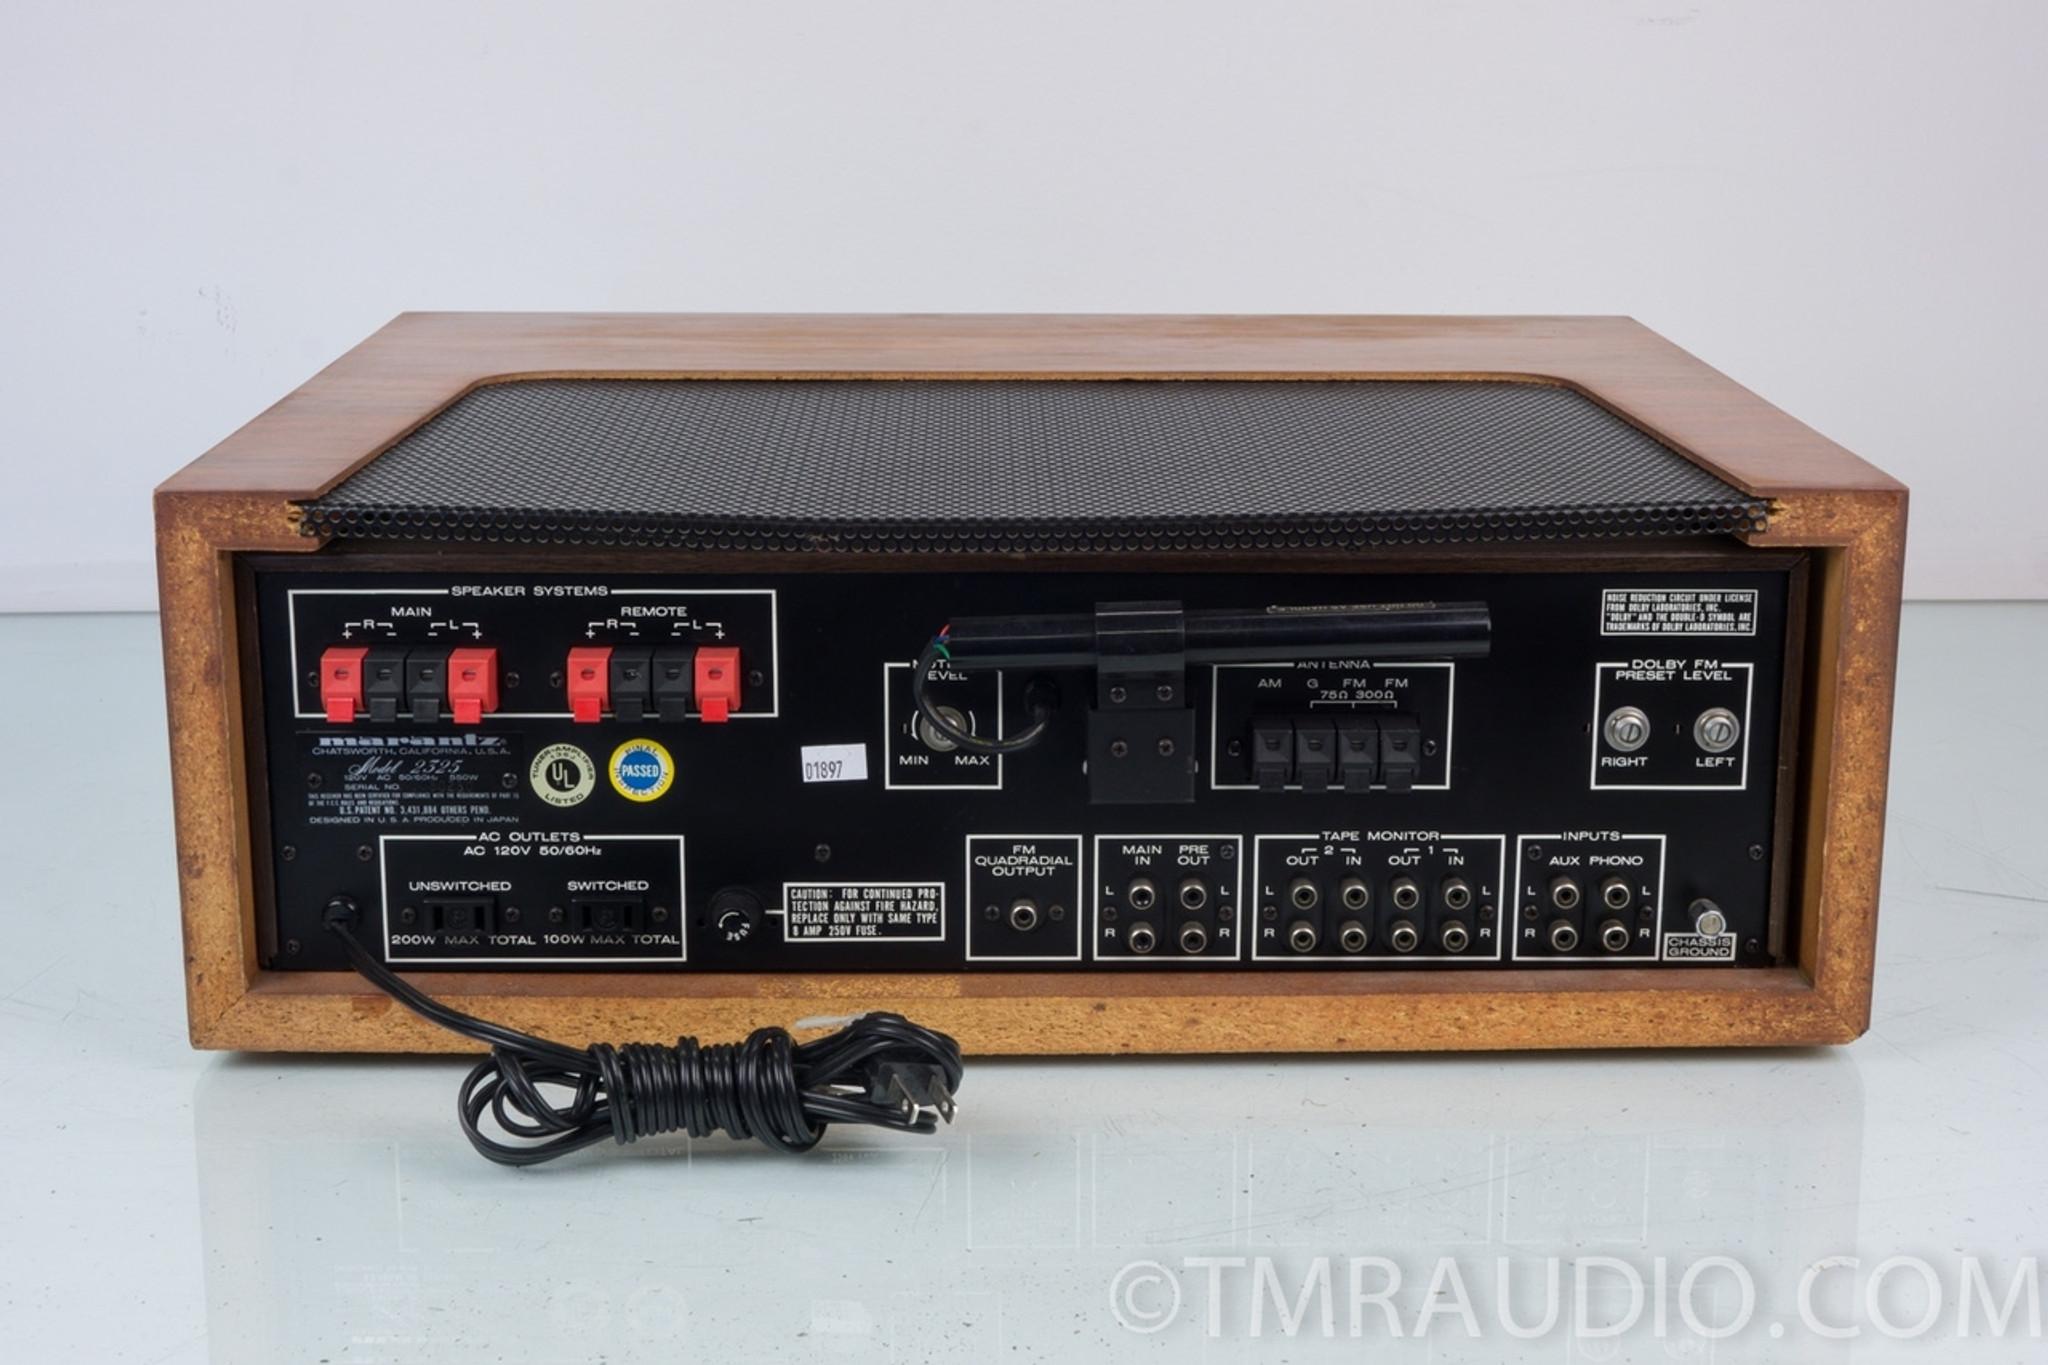 Marantz 2325 Vintage AM/FM Stereo Receiver with Wood Case